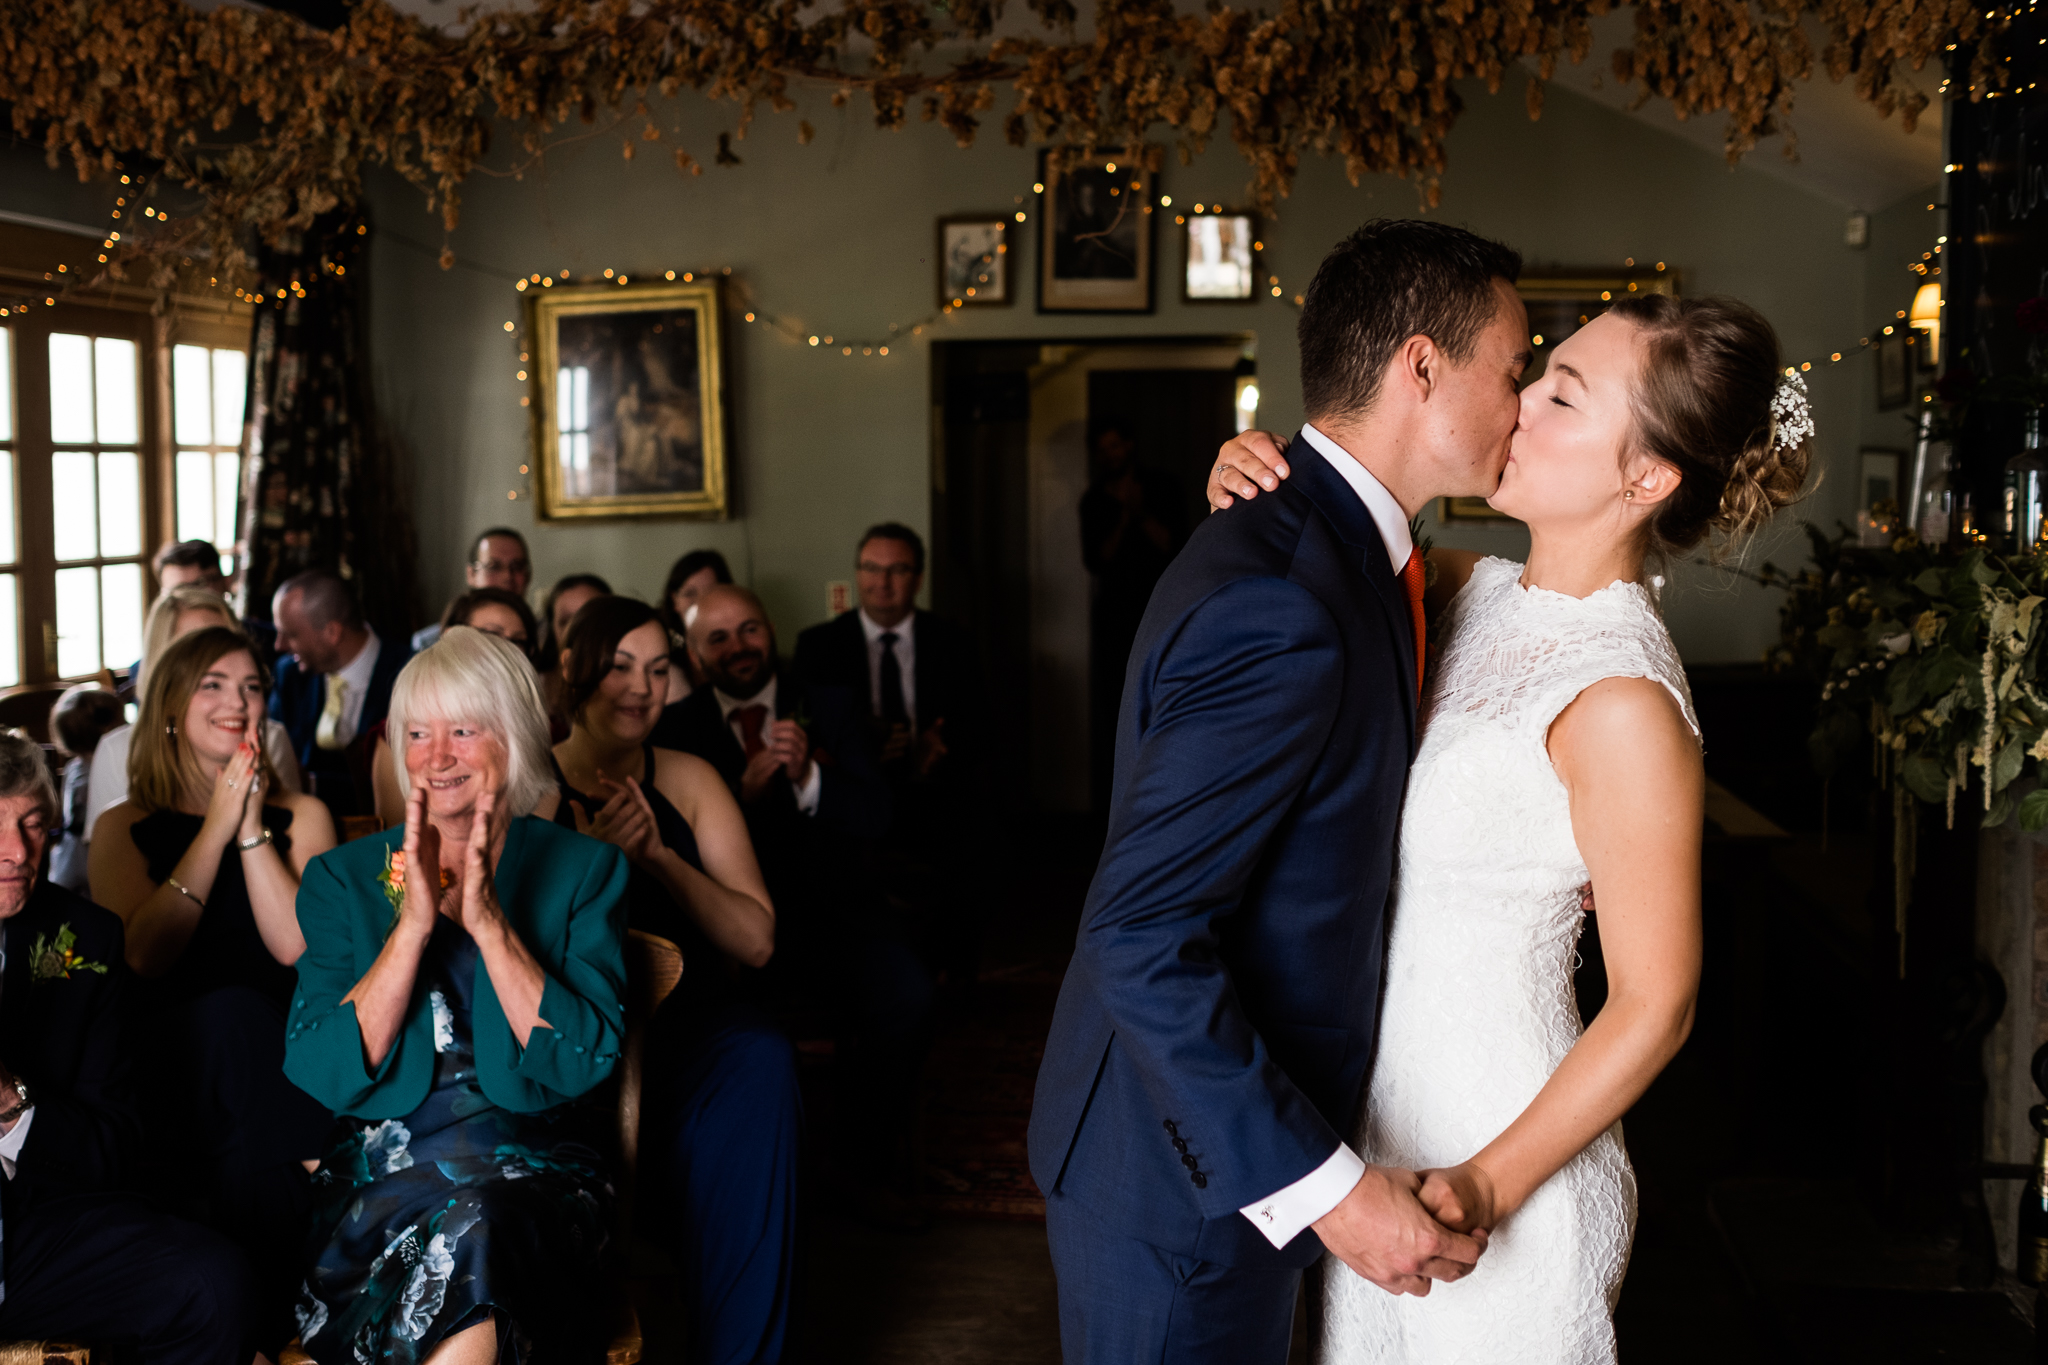 Relaxed Documentary Wedding Photography at The Wizard Inn, Alderley Edge Cheshire - Jenny Harper-33.jpg